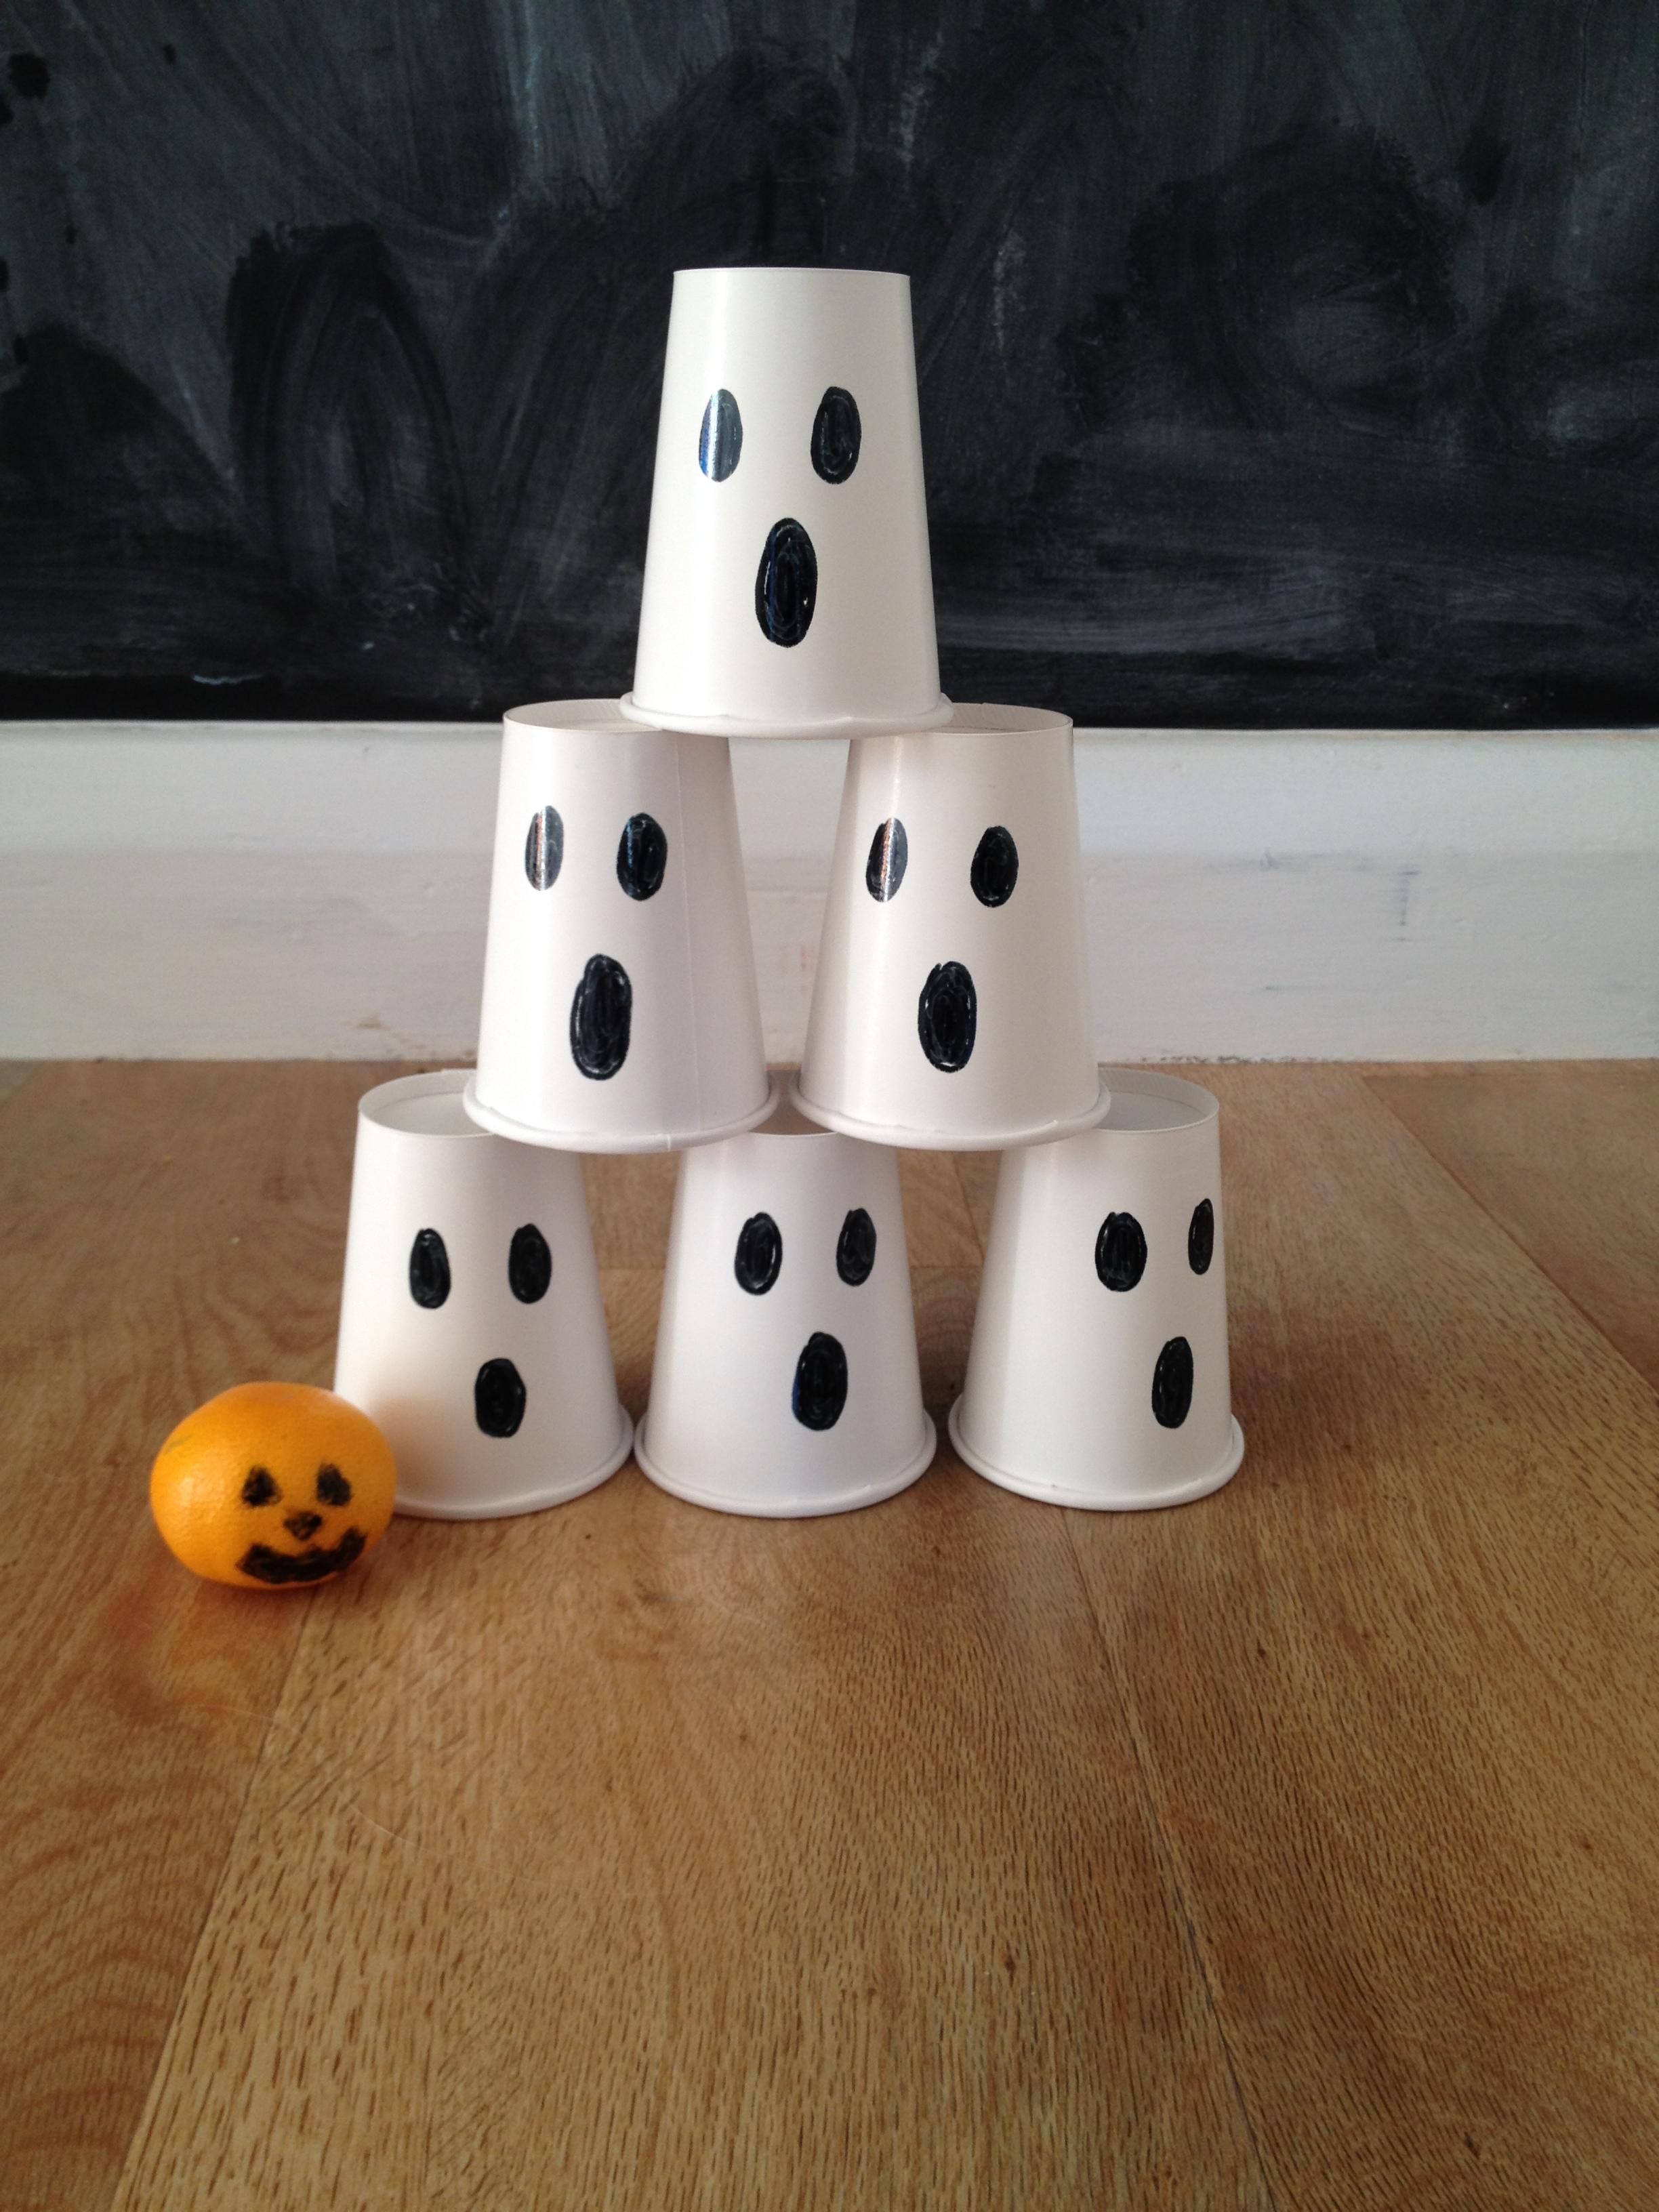 5 Fun Halloween Activities for Preschoolers! - The Spirited Puddle ...